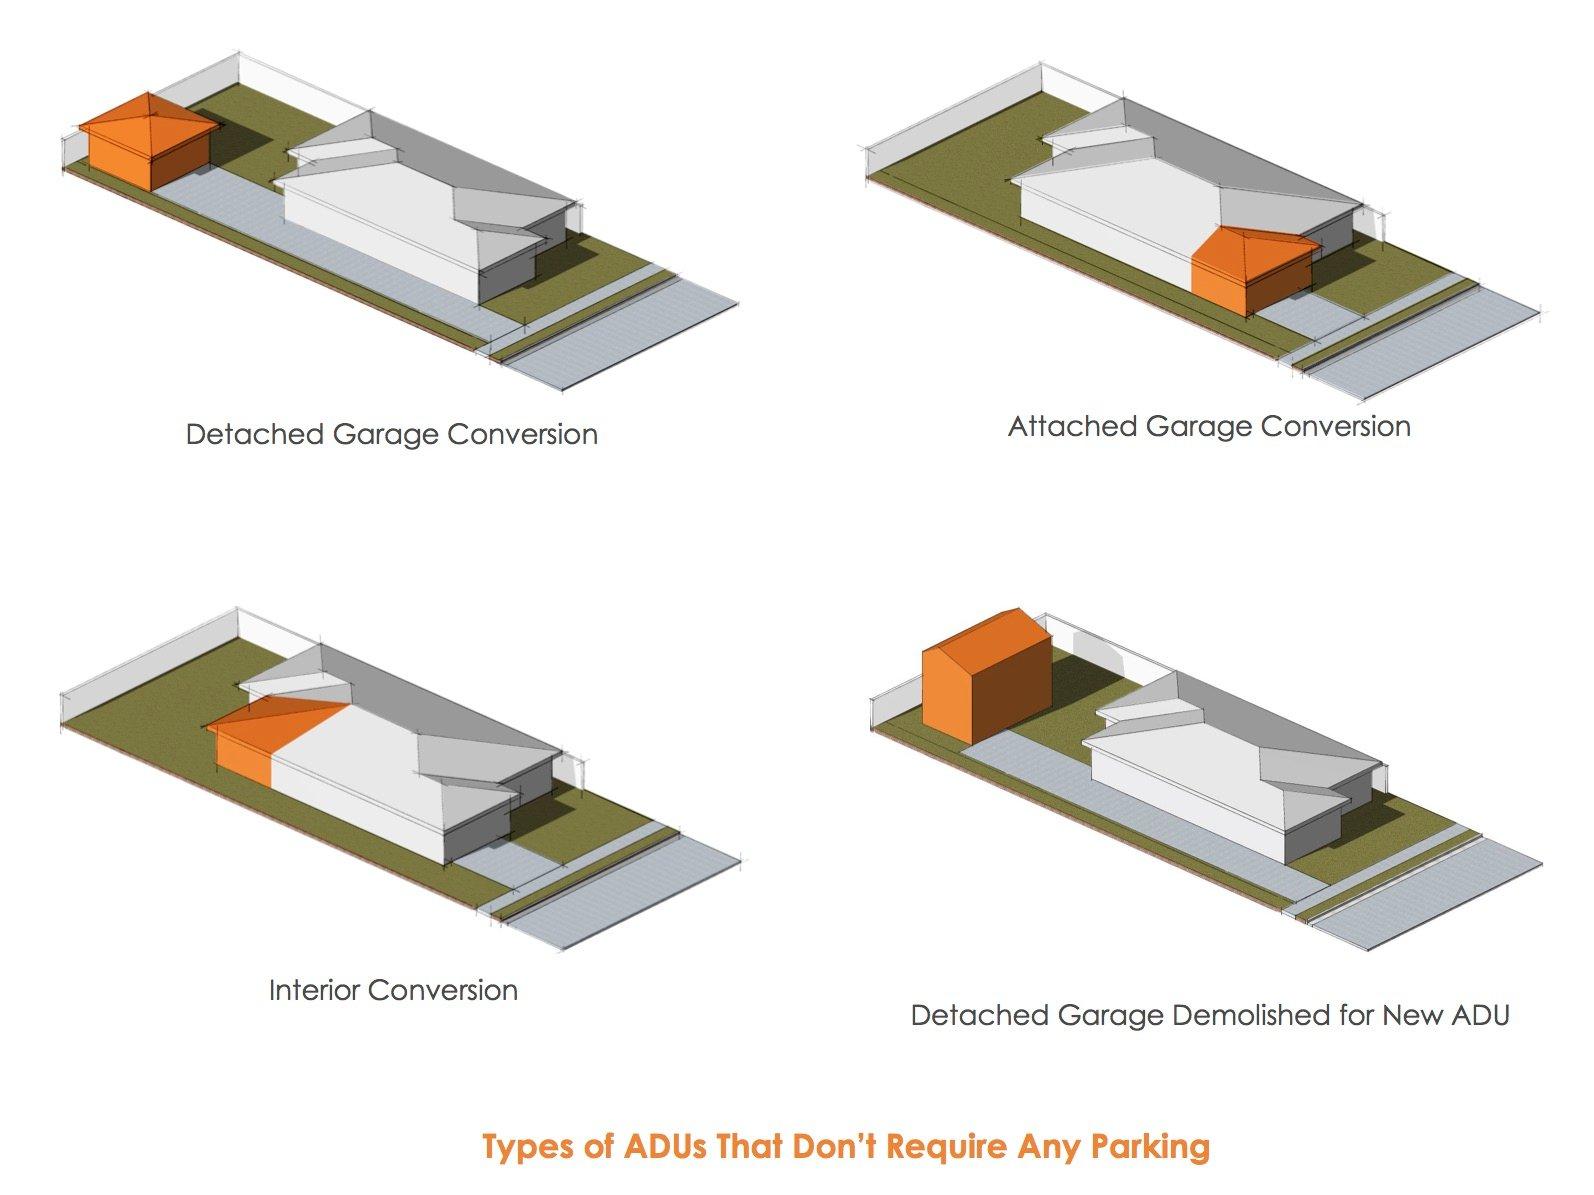 ADU Parking Exceptions